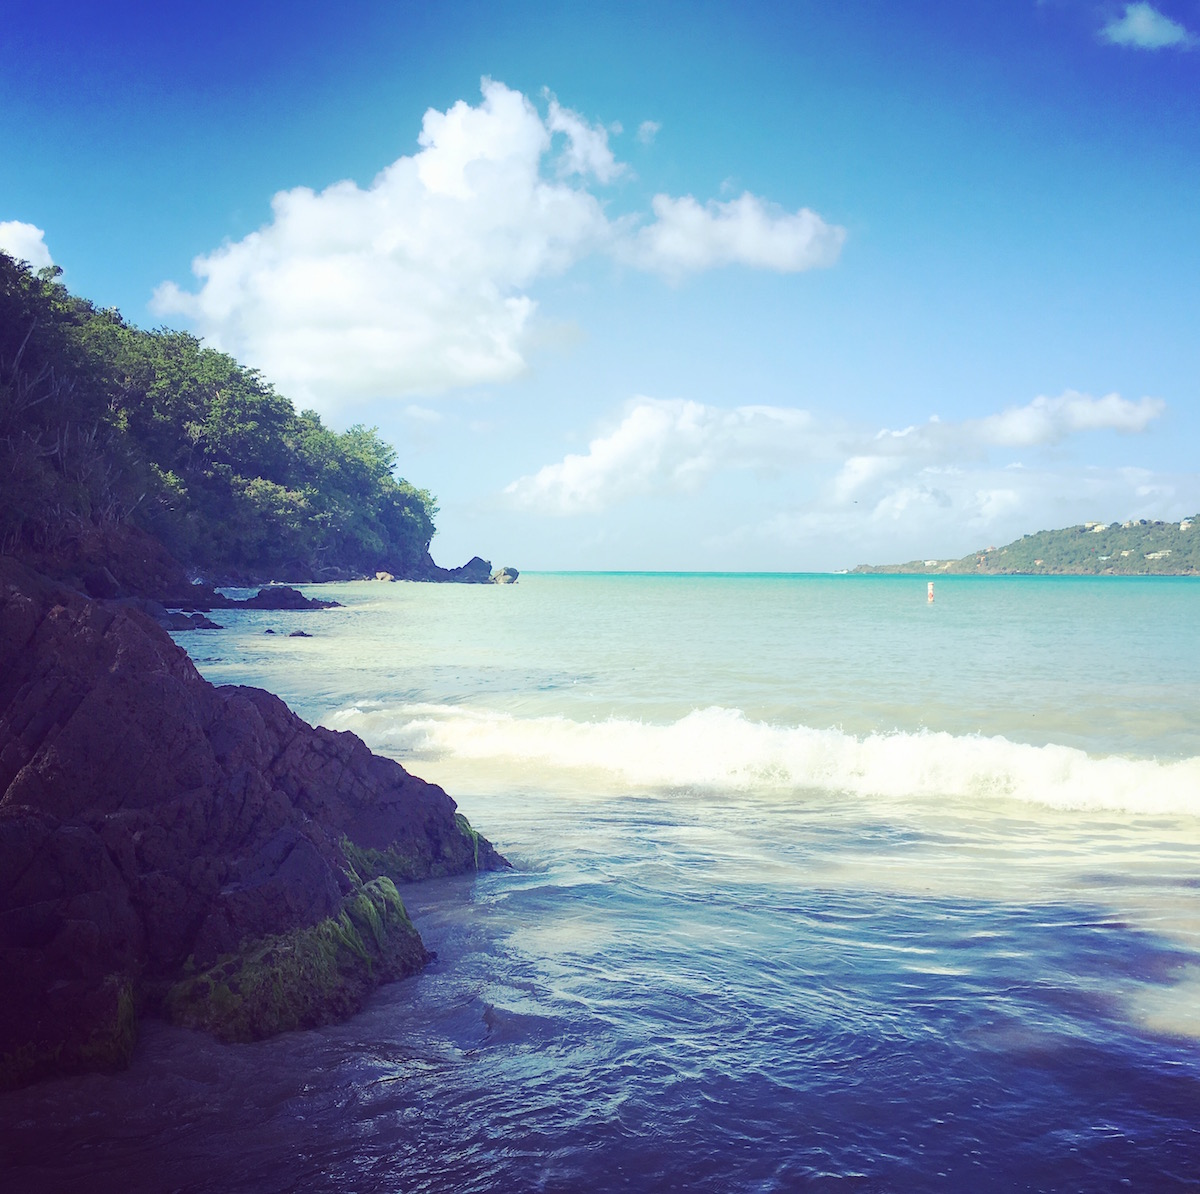 St. Thomas USVI - Magen's Bay Beach